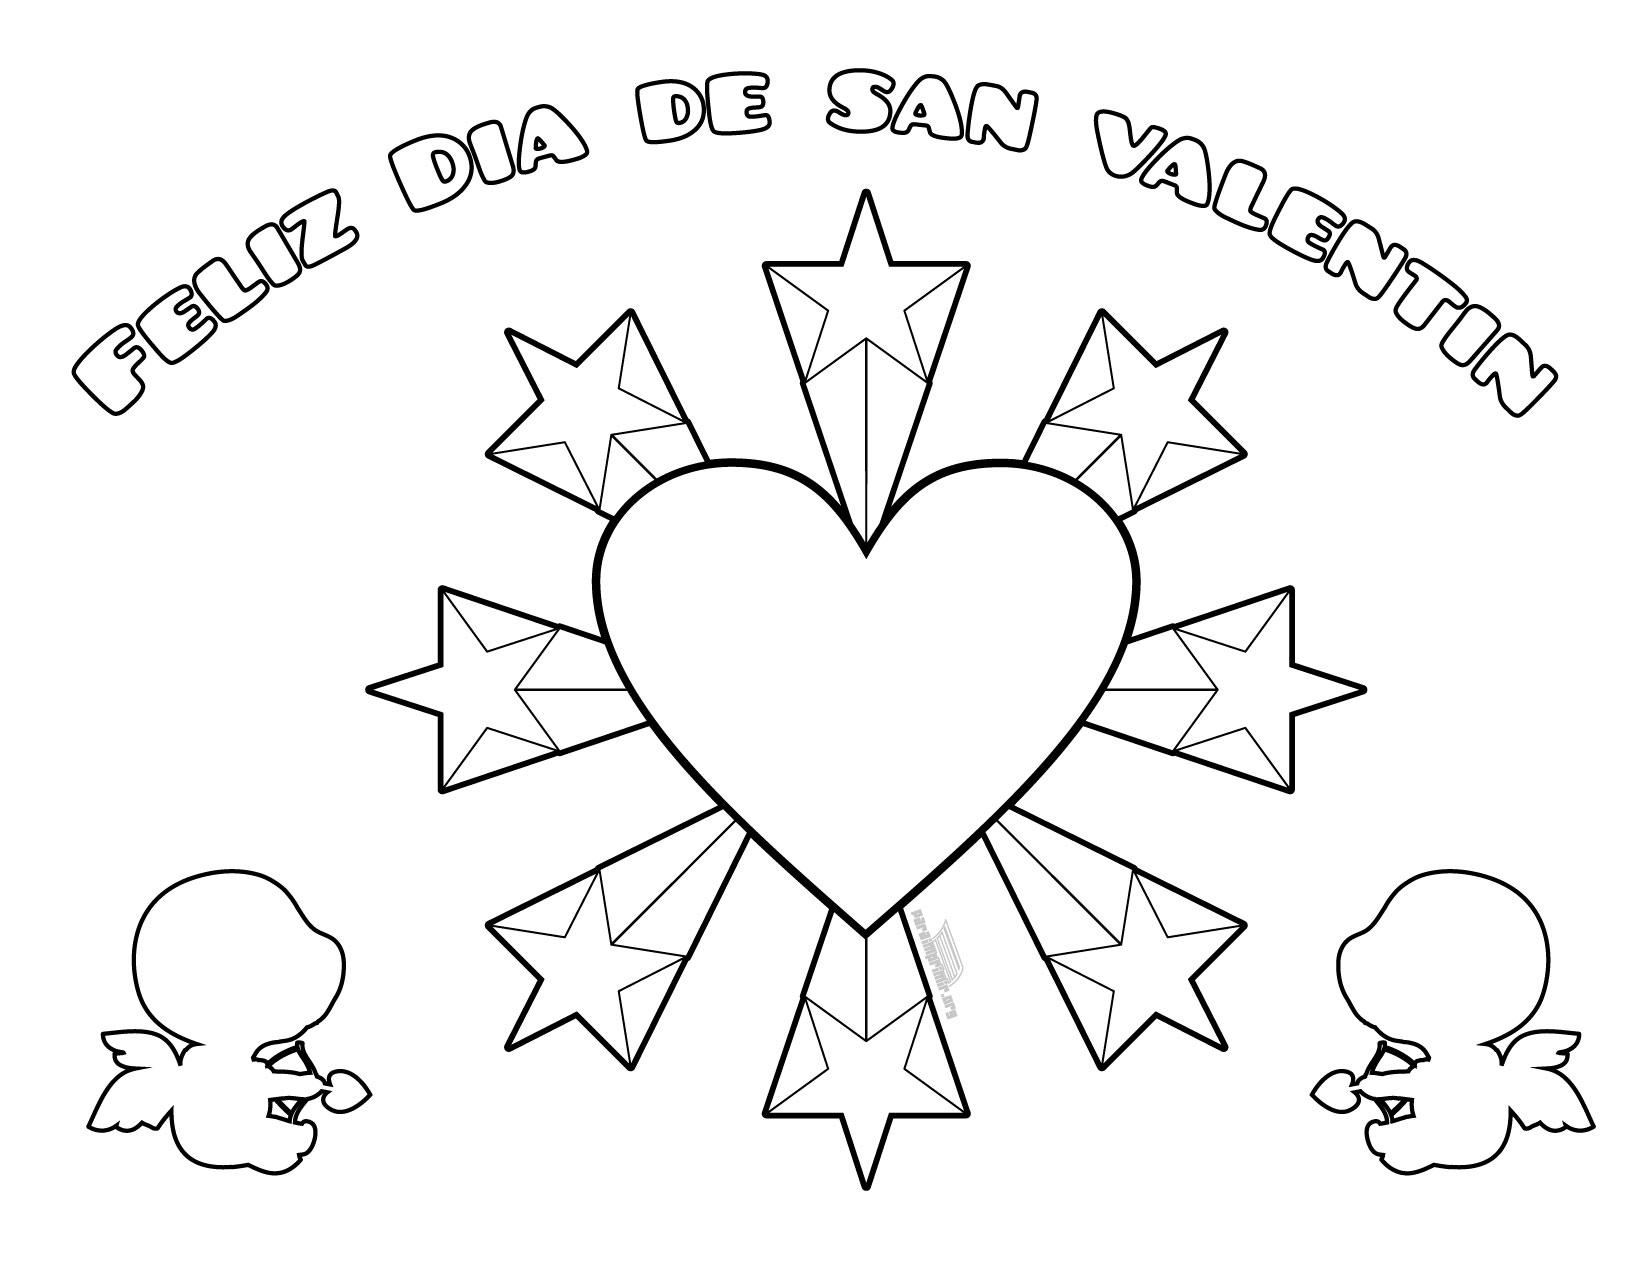 Vida valentine and america - 2 part 4